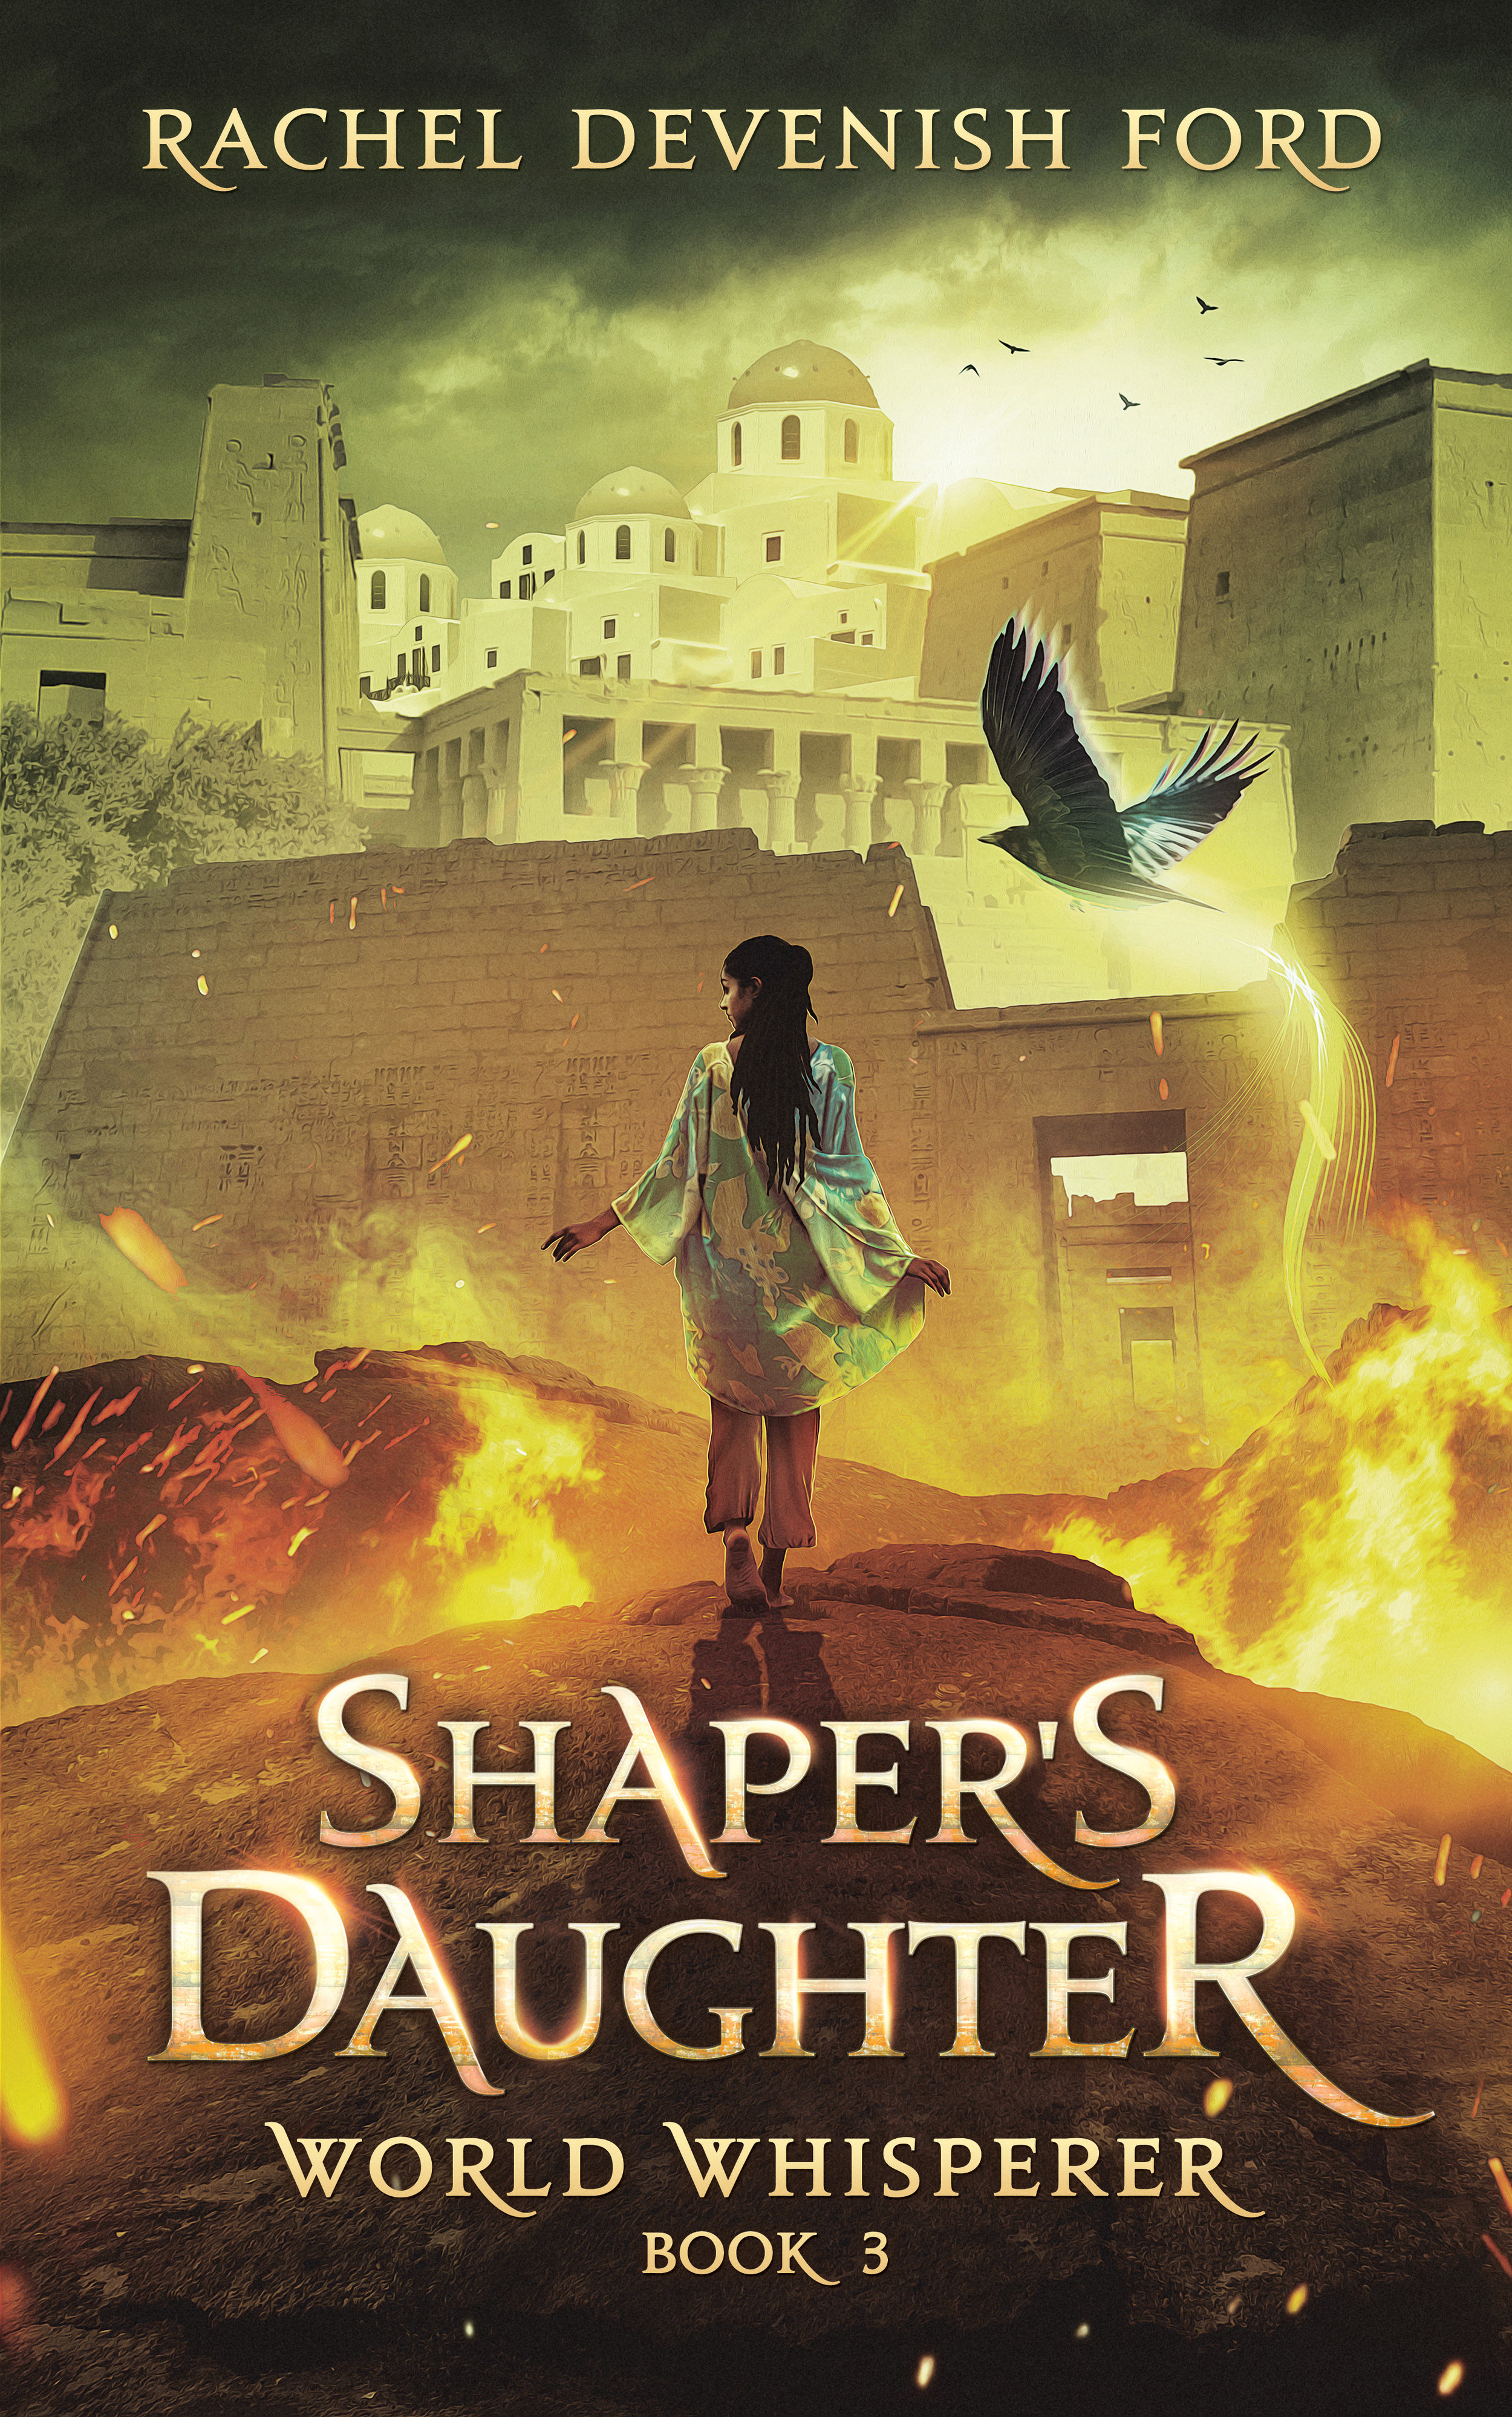 Shaper's Daughter - Ebook.jpg